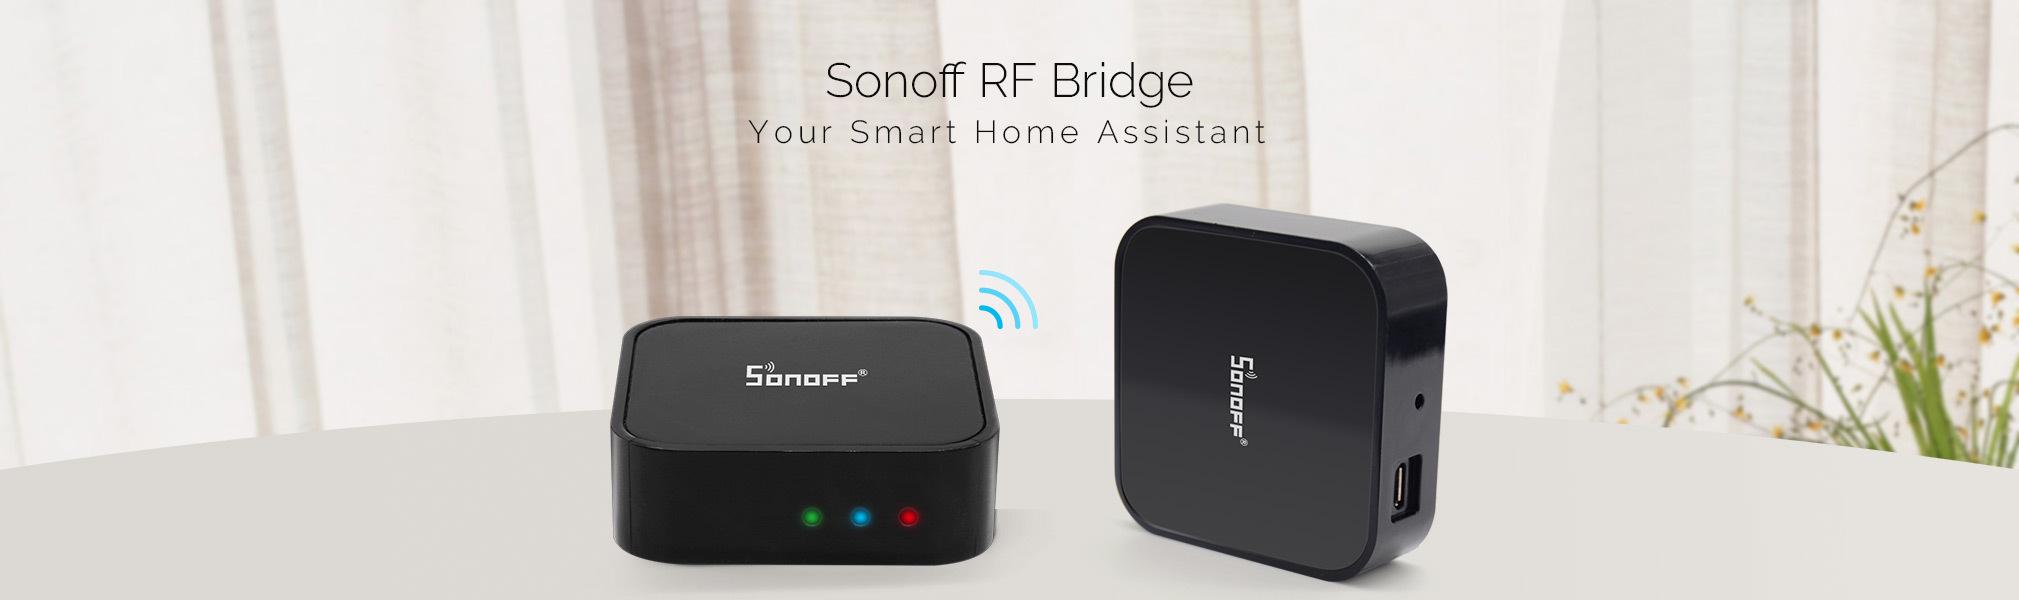 Sonoff RF Bridge 433